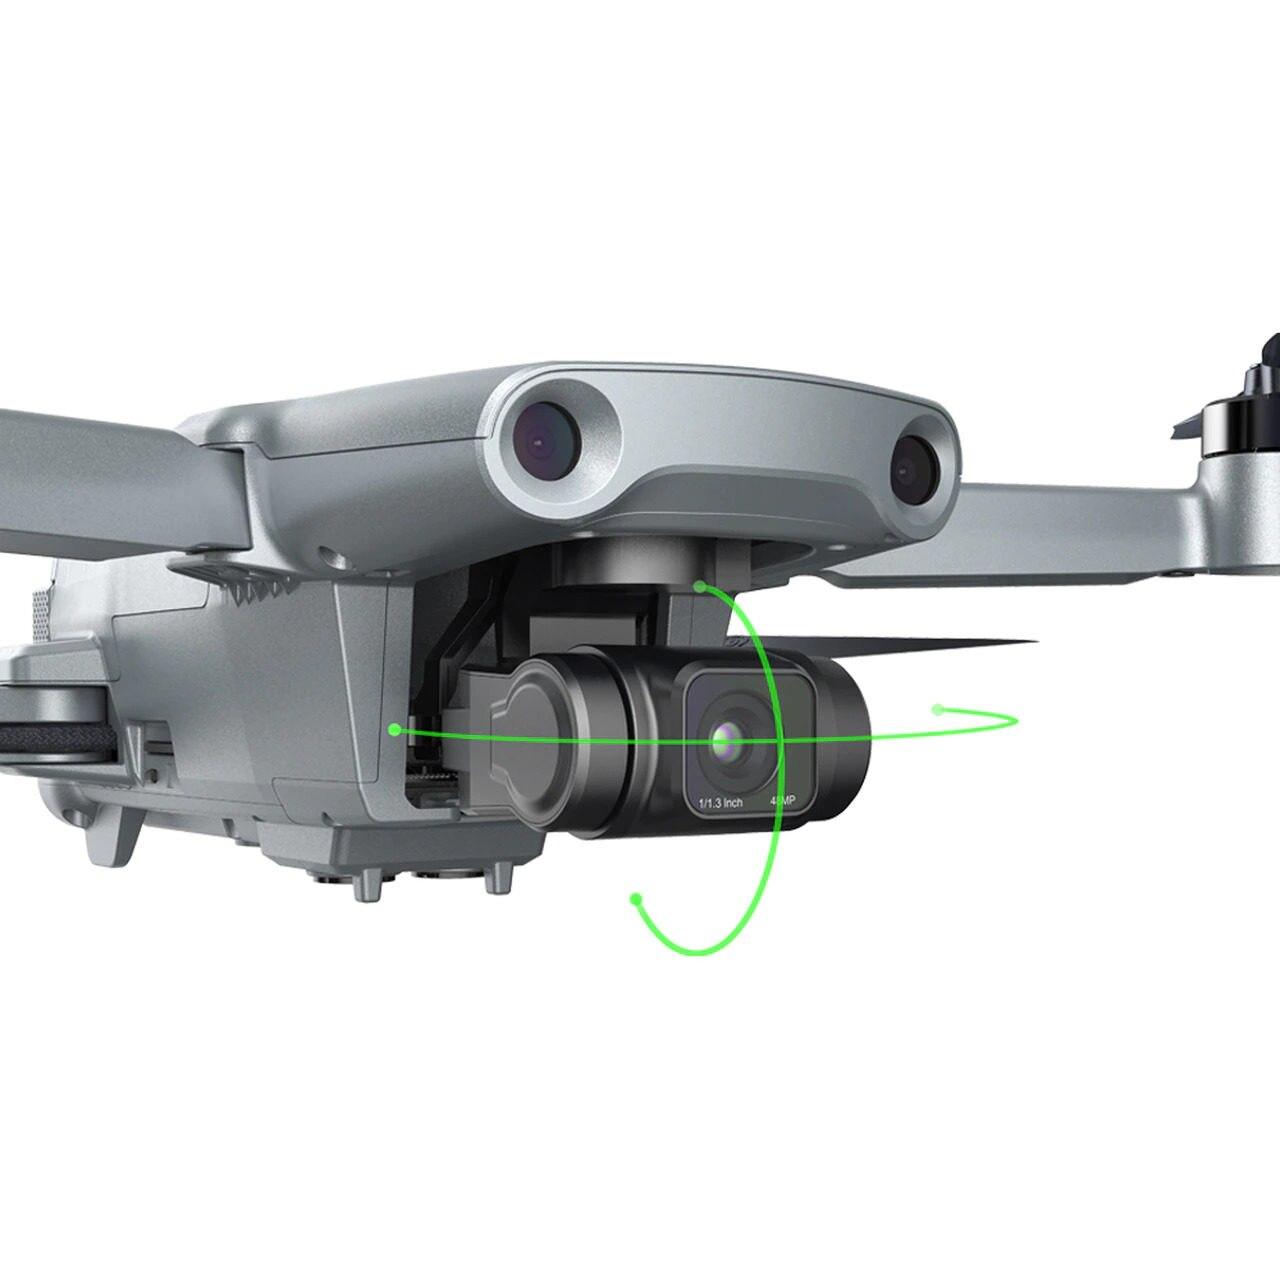 Hubsan Drone ZINO Mini PRO 249g GPS 10KM FPV 4K 30fps Camera 3-Axis Gimbal RC Quadcopter Discounts Code: LF15AS5OAPT5 5